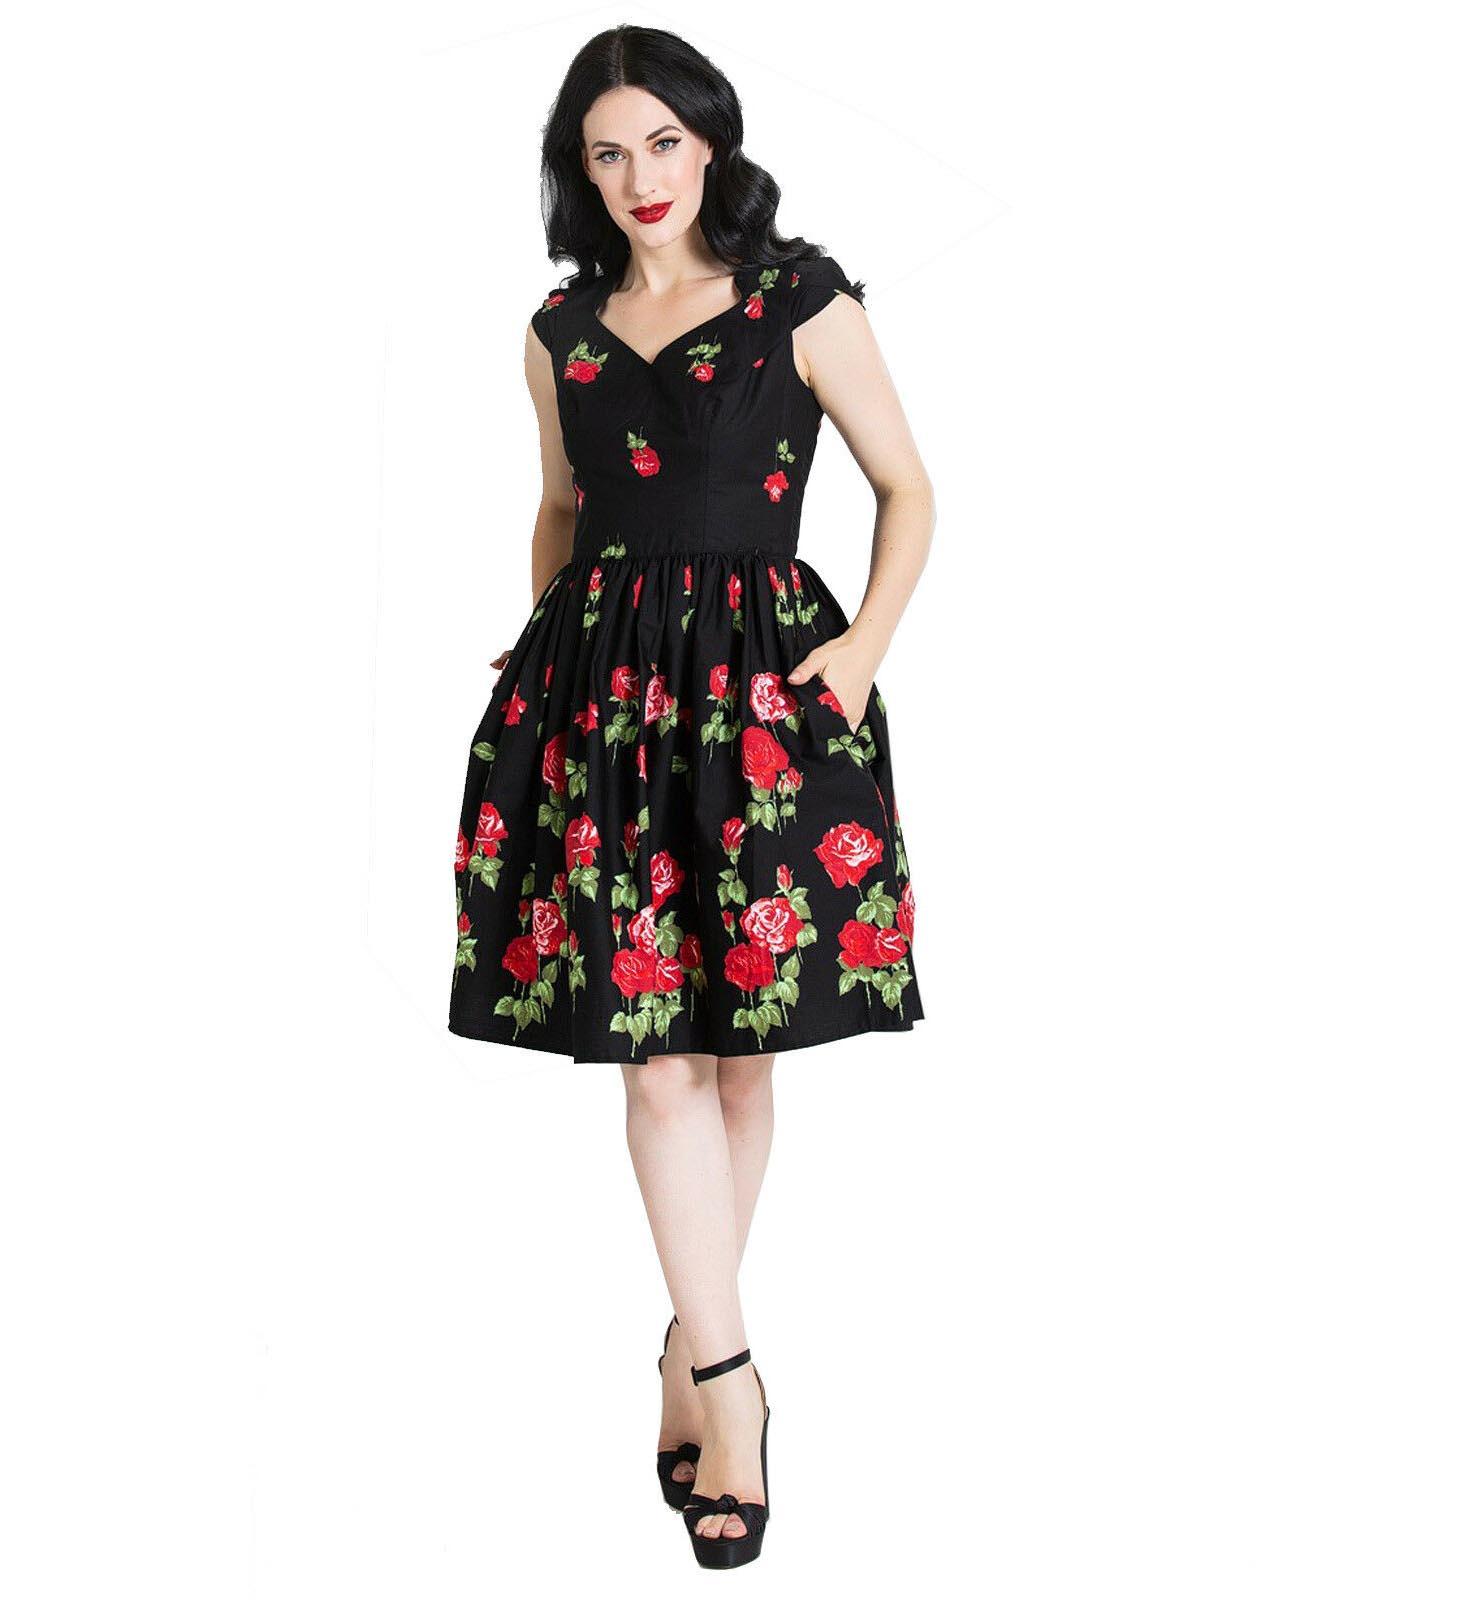 Hell-Bunny-Pin-Up-Mid-Length-50s-Dress-ANTONIA-Rose-Floral-Black thumbnail 23